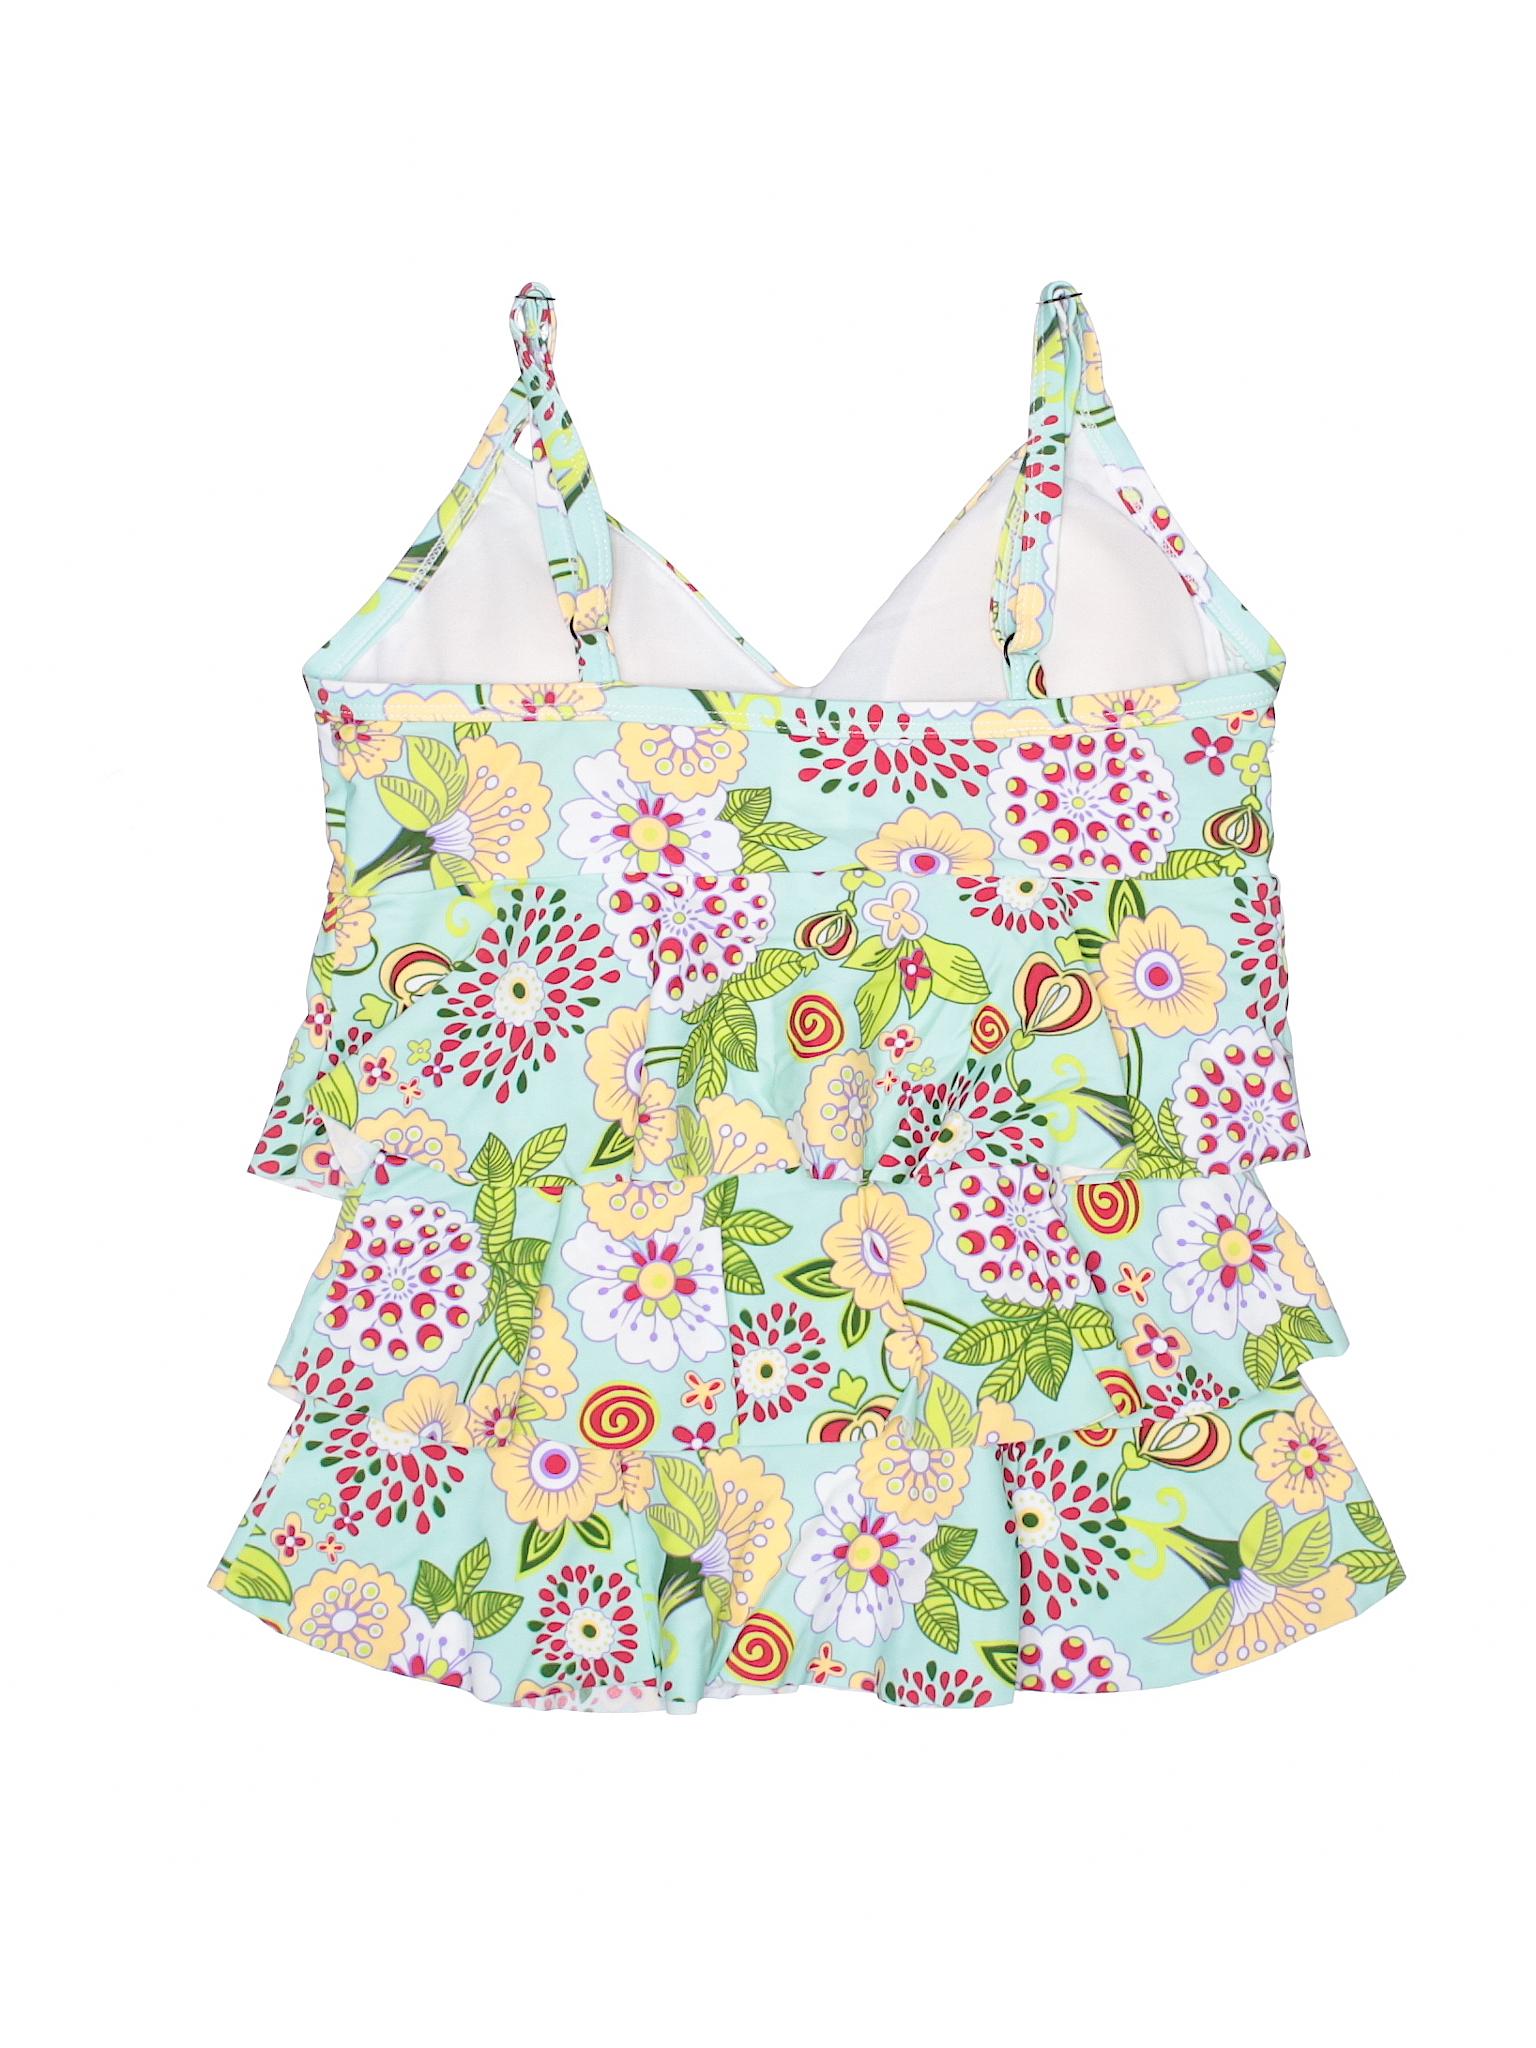 Top Bod Mod Swim Swimsuit Boutique IH74wq5W8